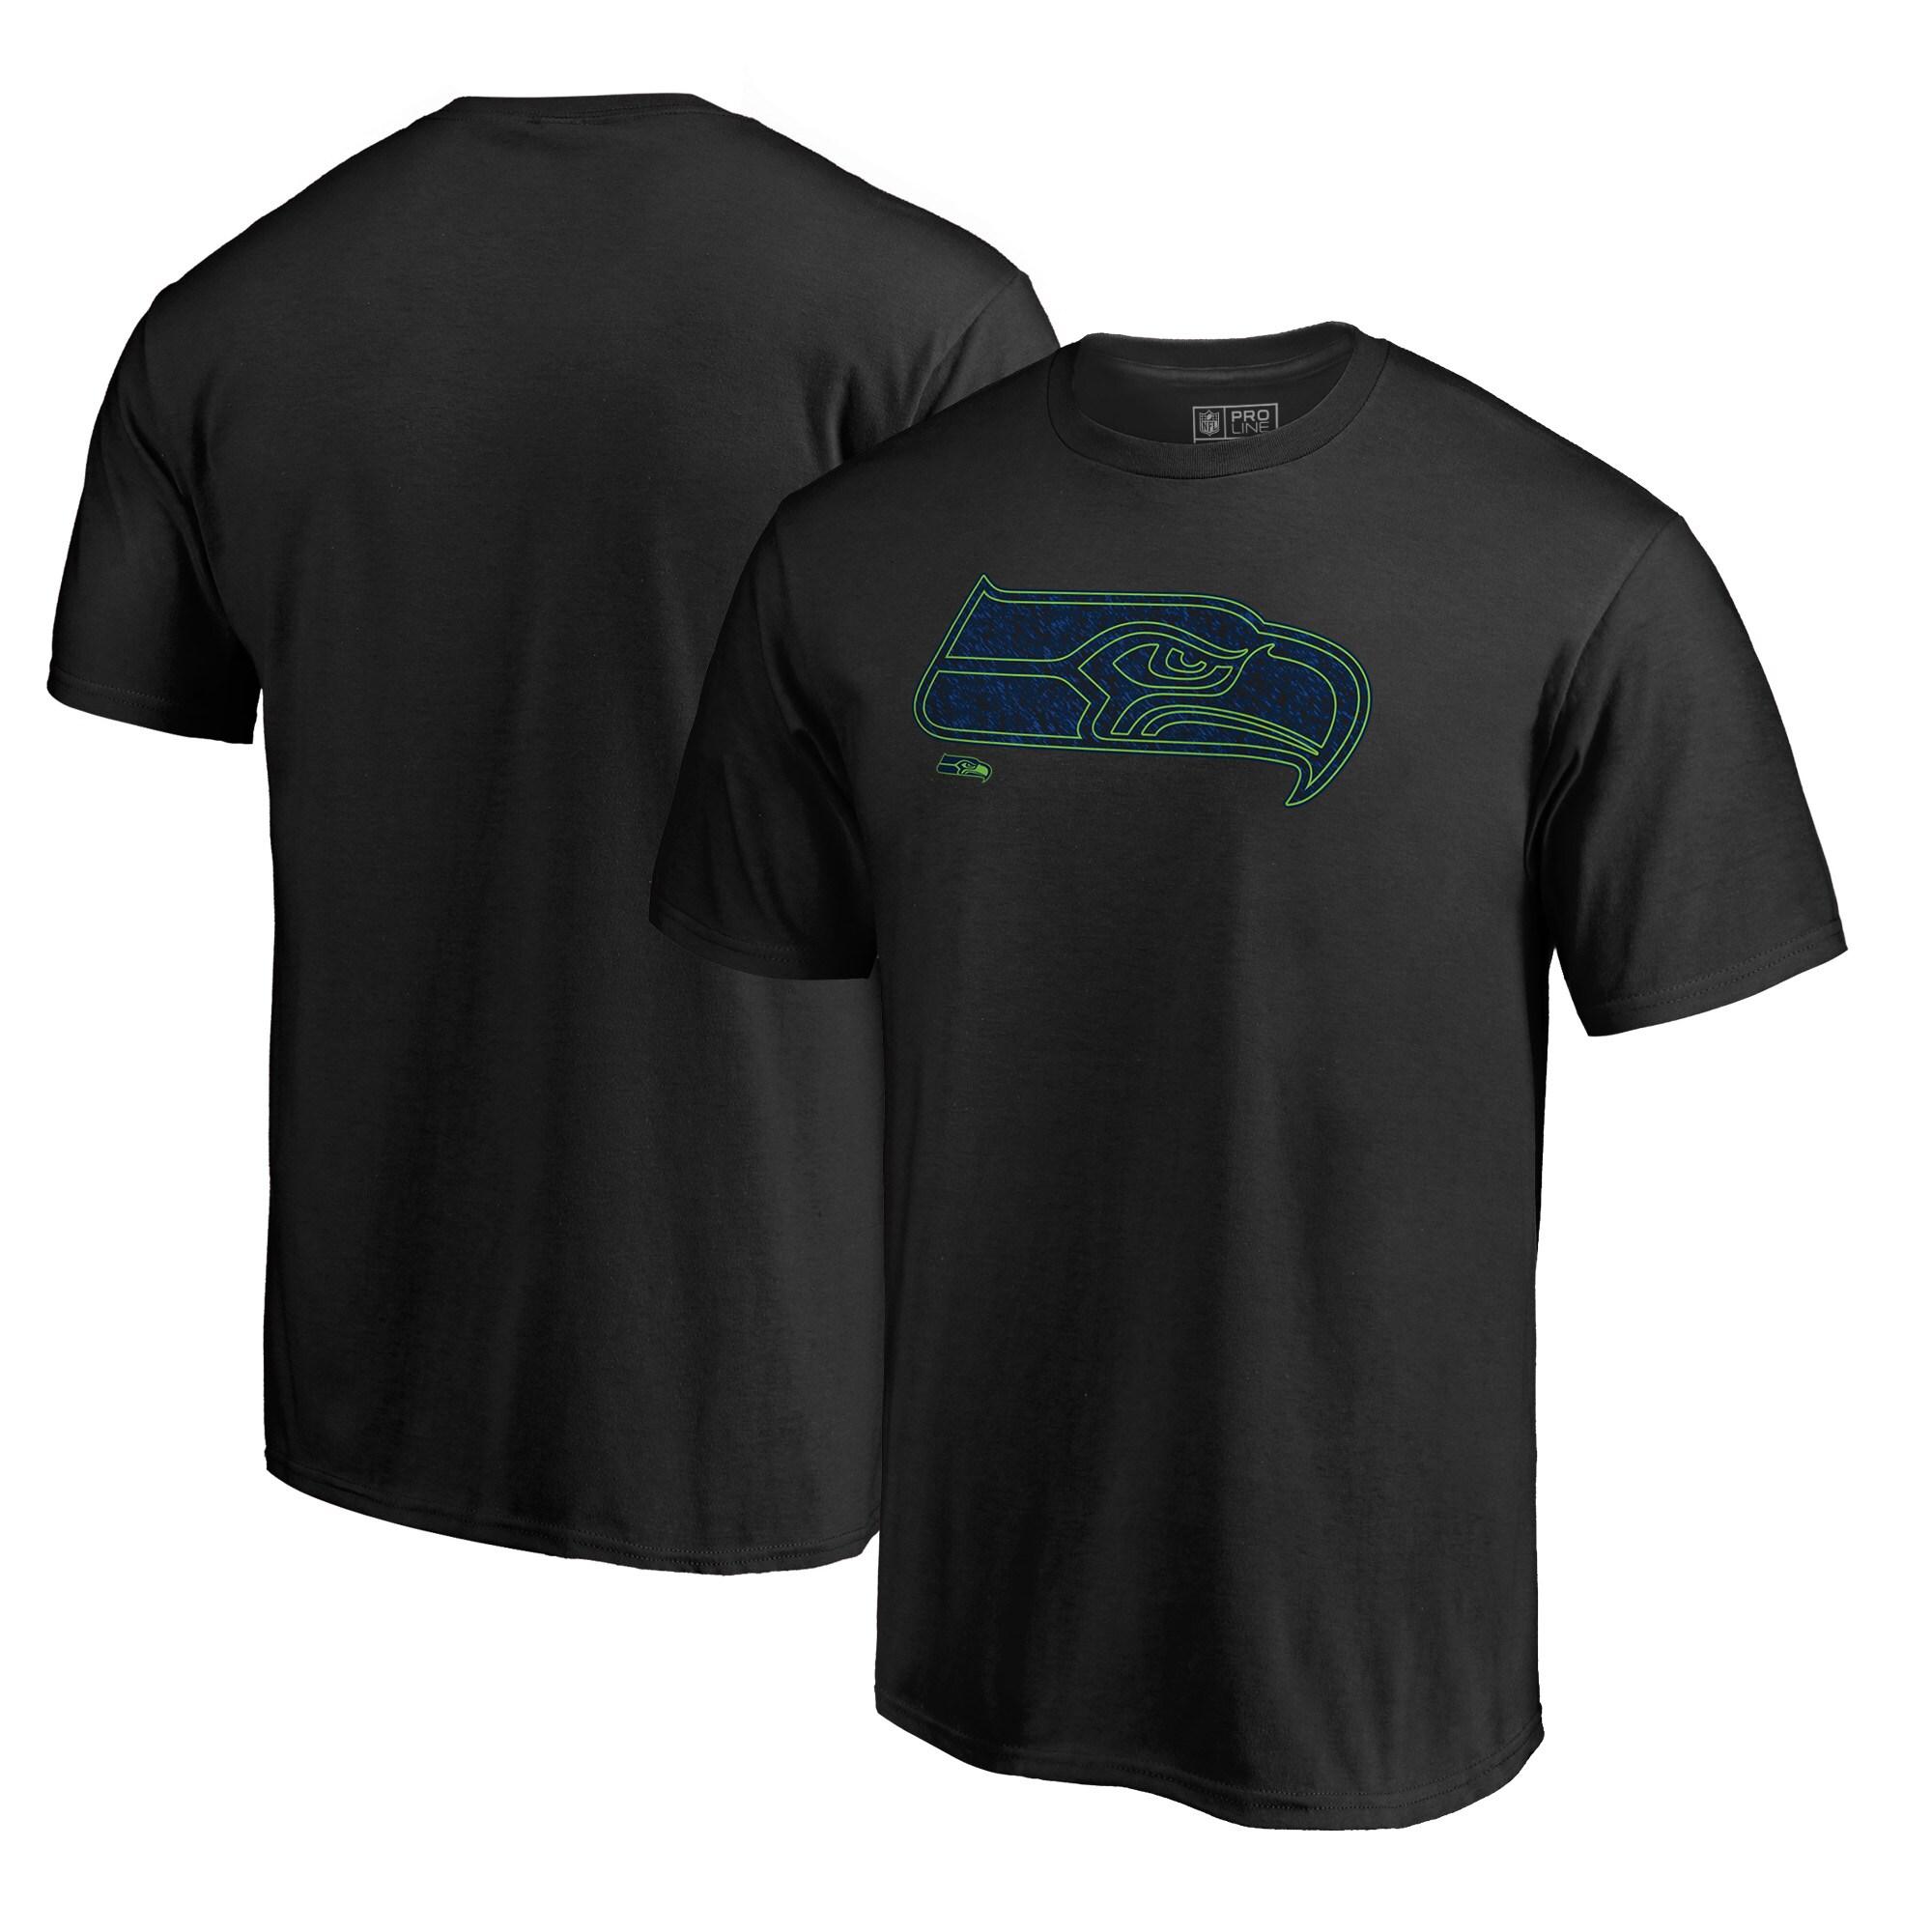 Seattle Seahawks NFL Pro Line by Fanatics Branded Training Camp Hookup T-Shirt - Black